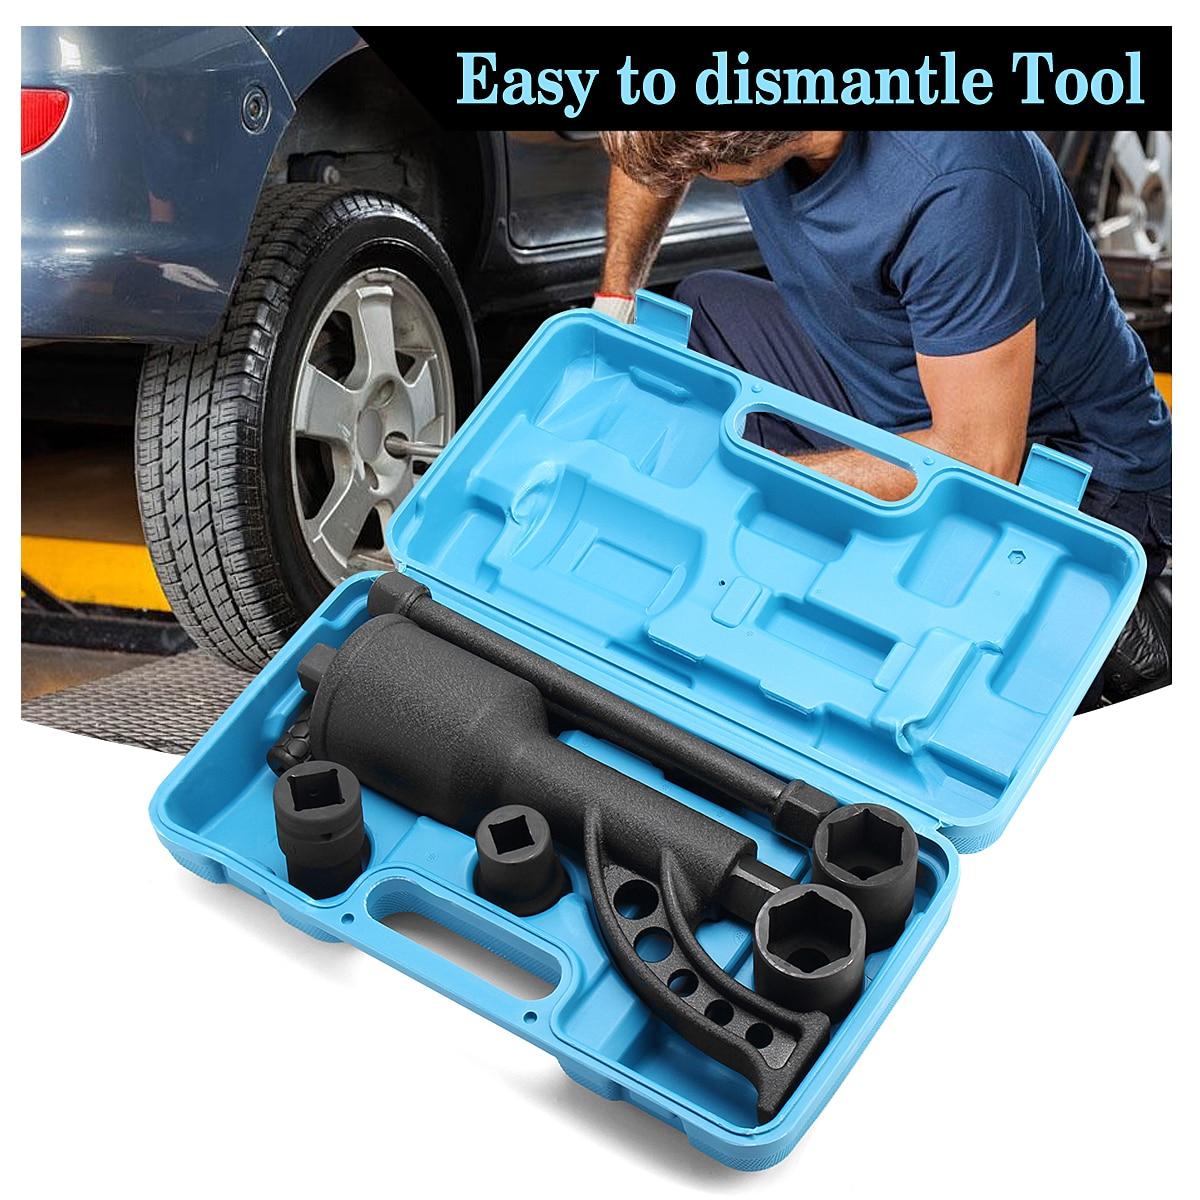 7 PCS Heavy Torque Multiplier Wrench Lug Nut Lugnuts Remover Labor Saving Socket Car Wash Maintenance Engine Care